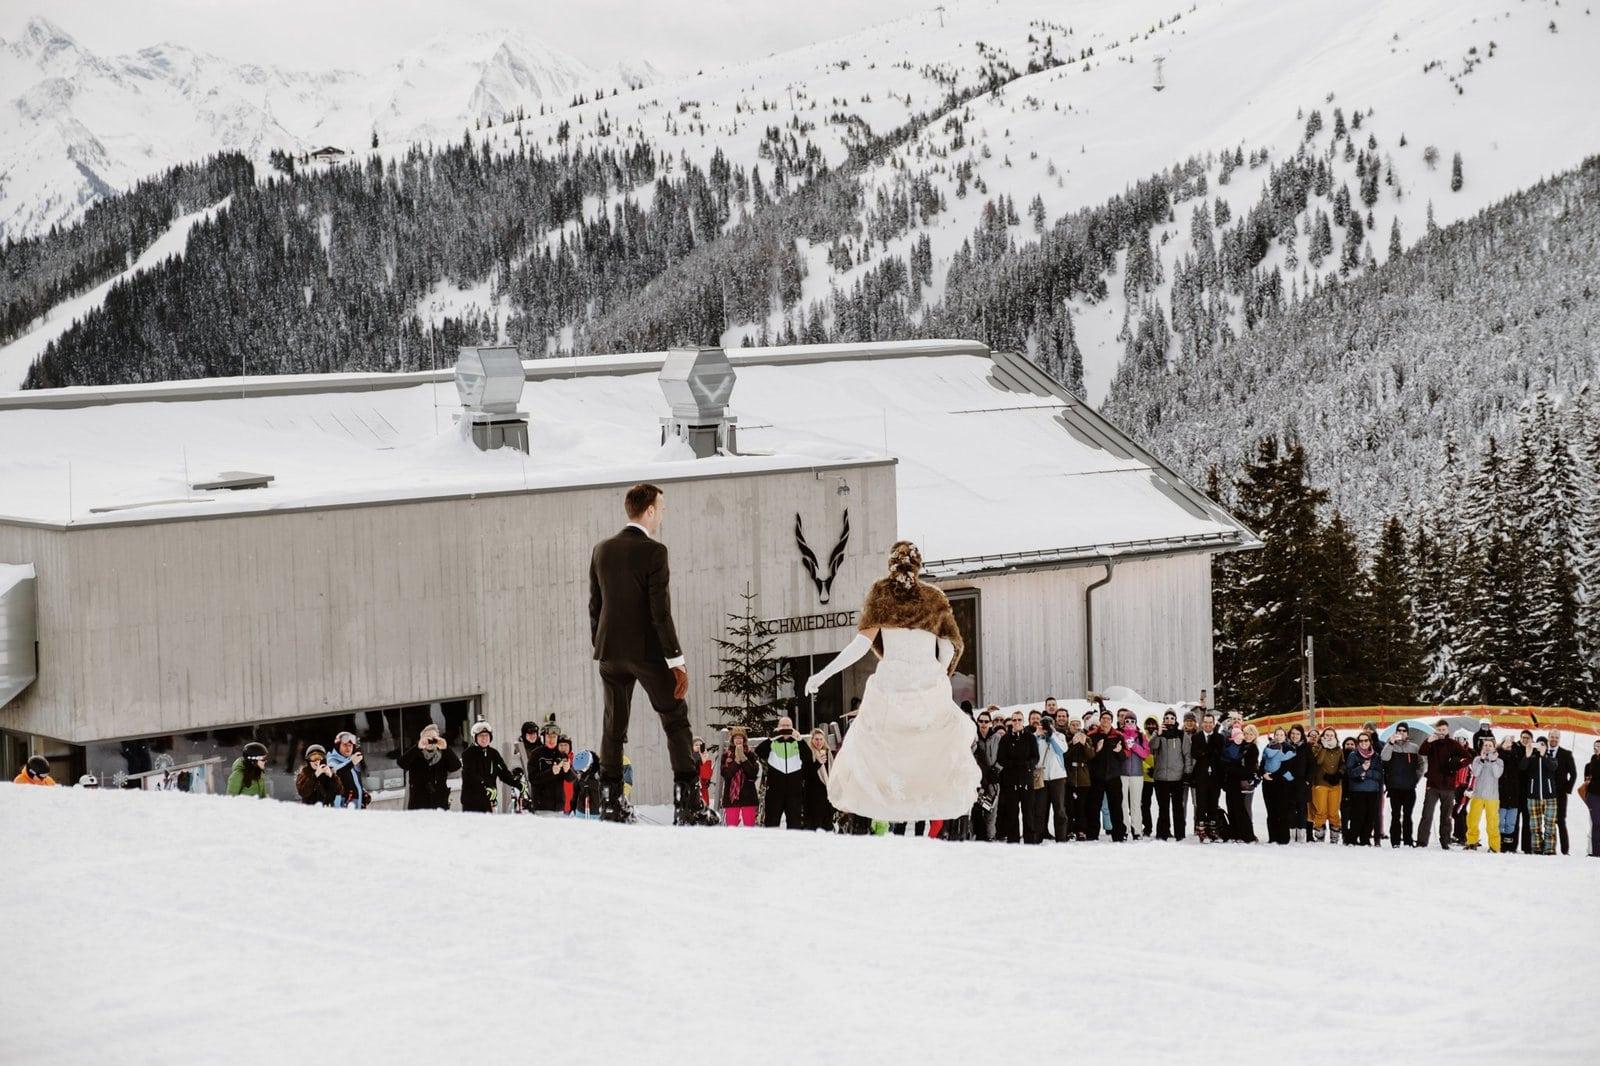 bride and groom snowboarding together